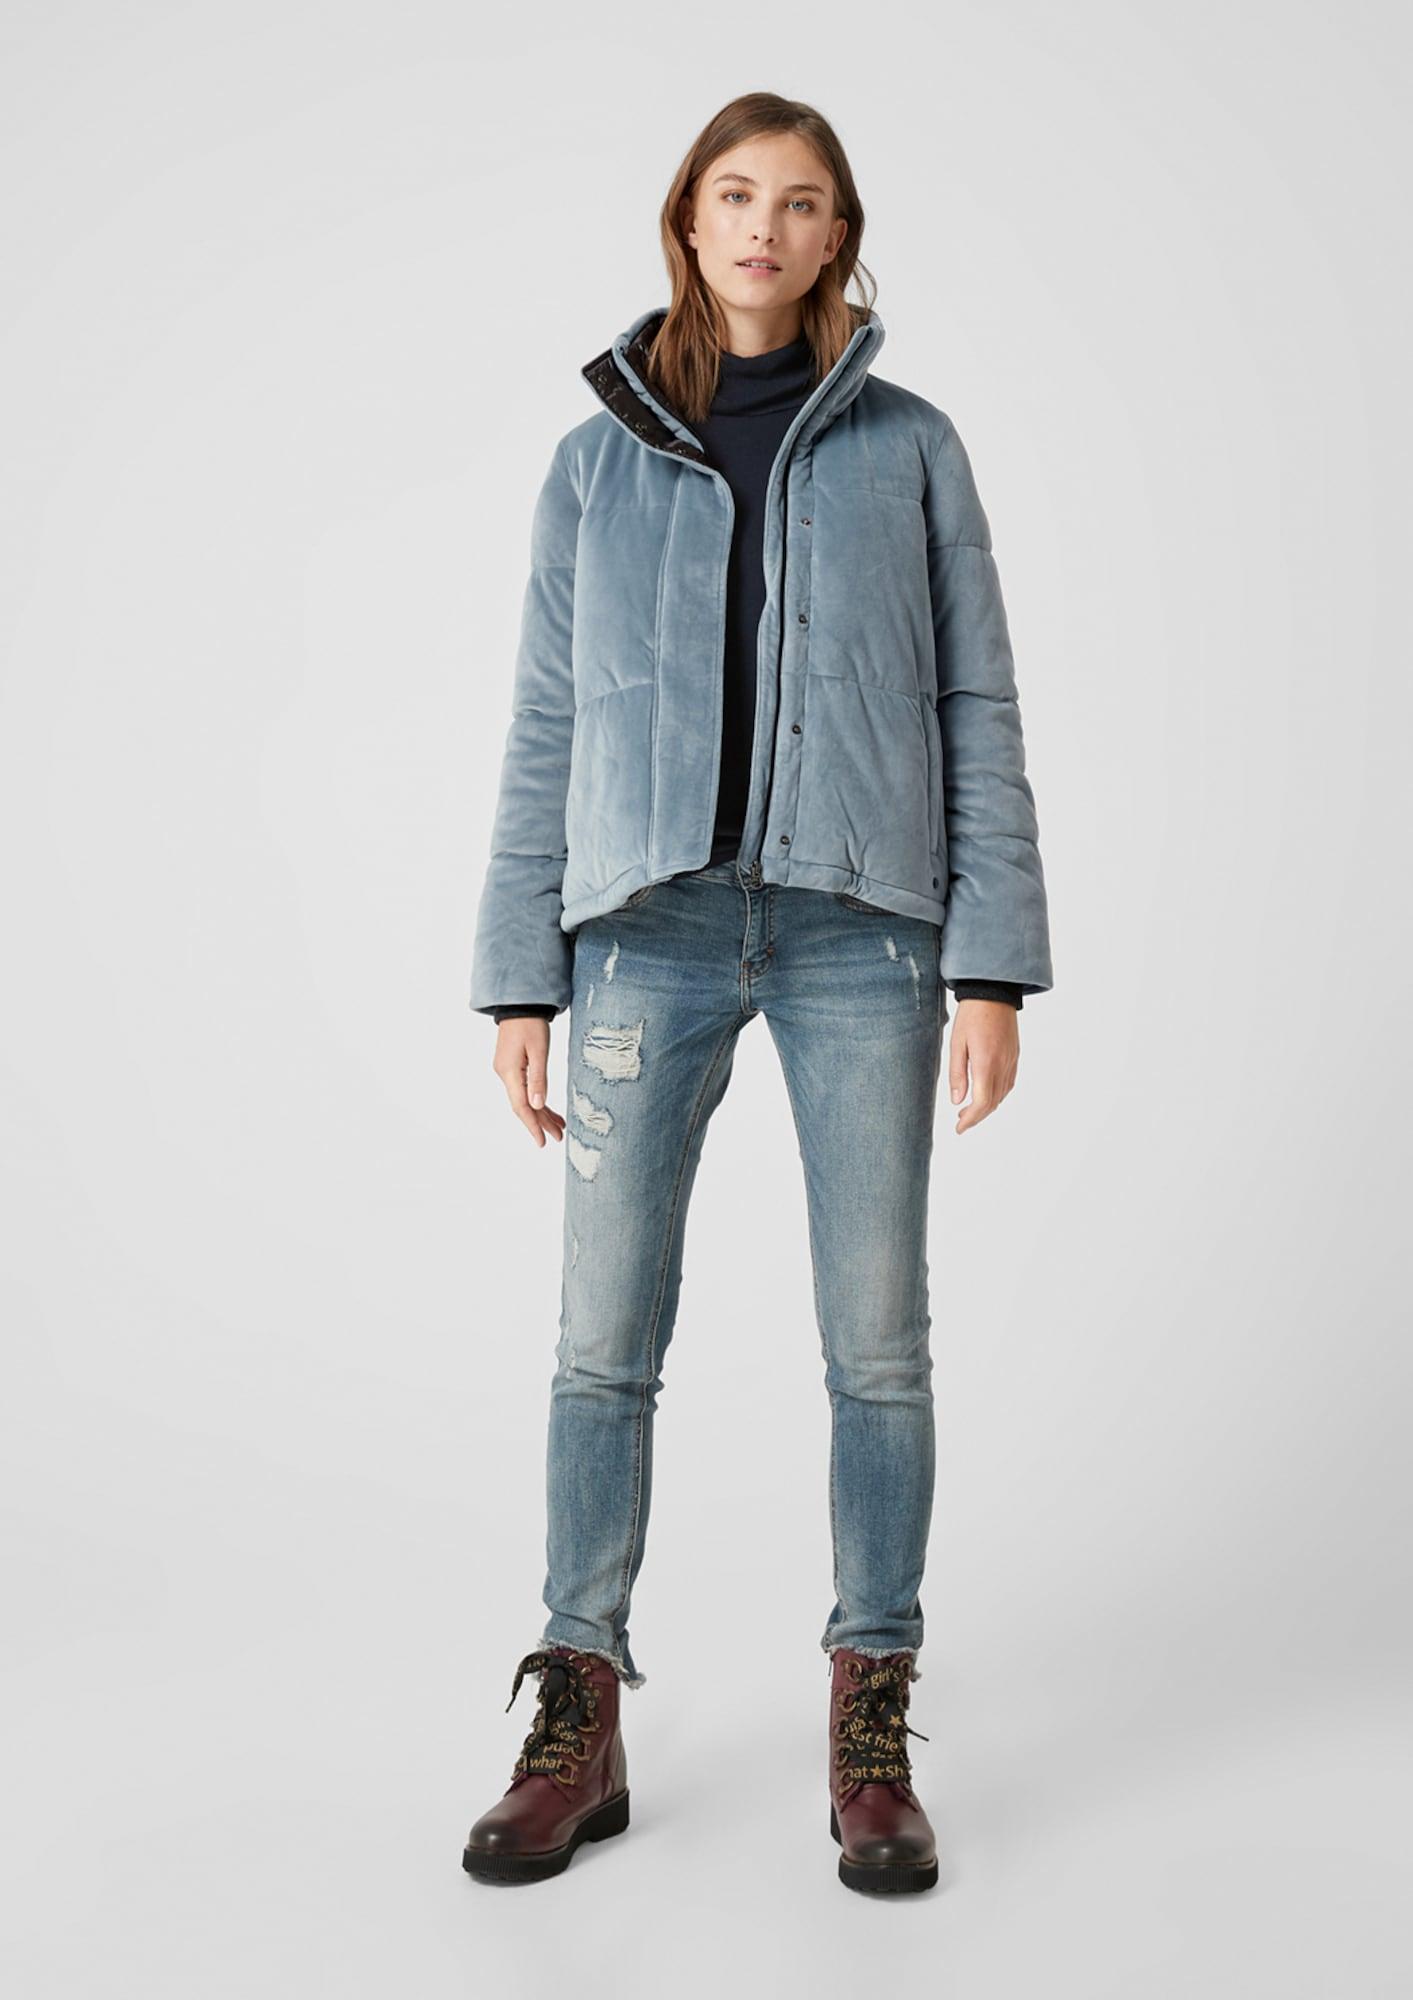 s.oliver - Puffer Jacket aus Samt